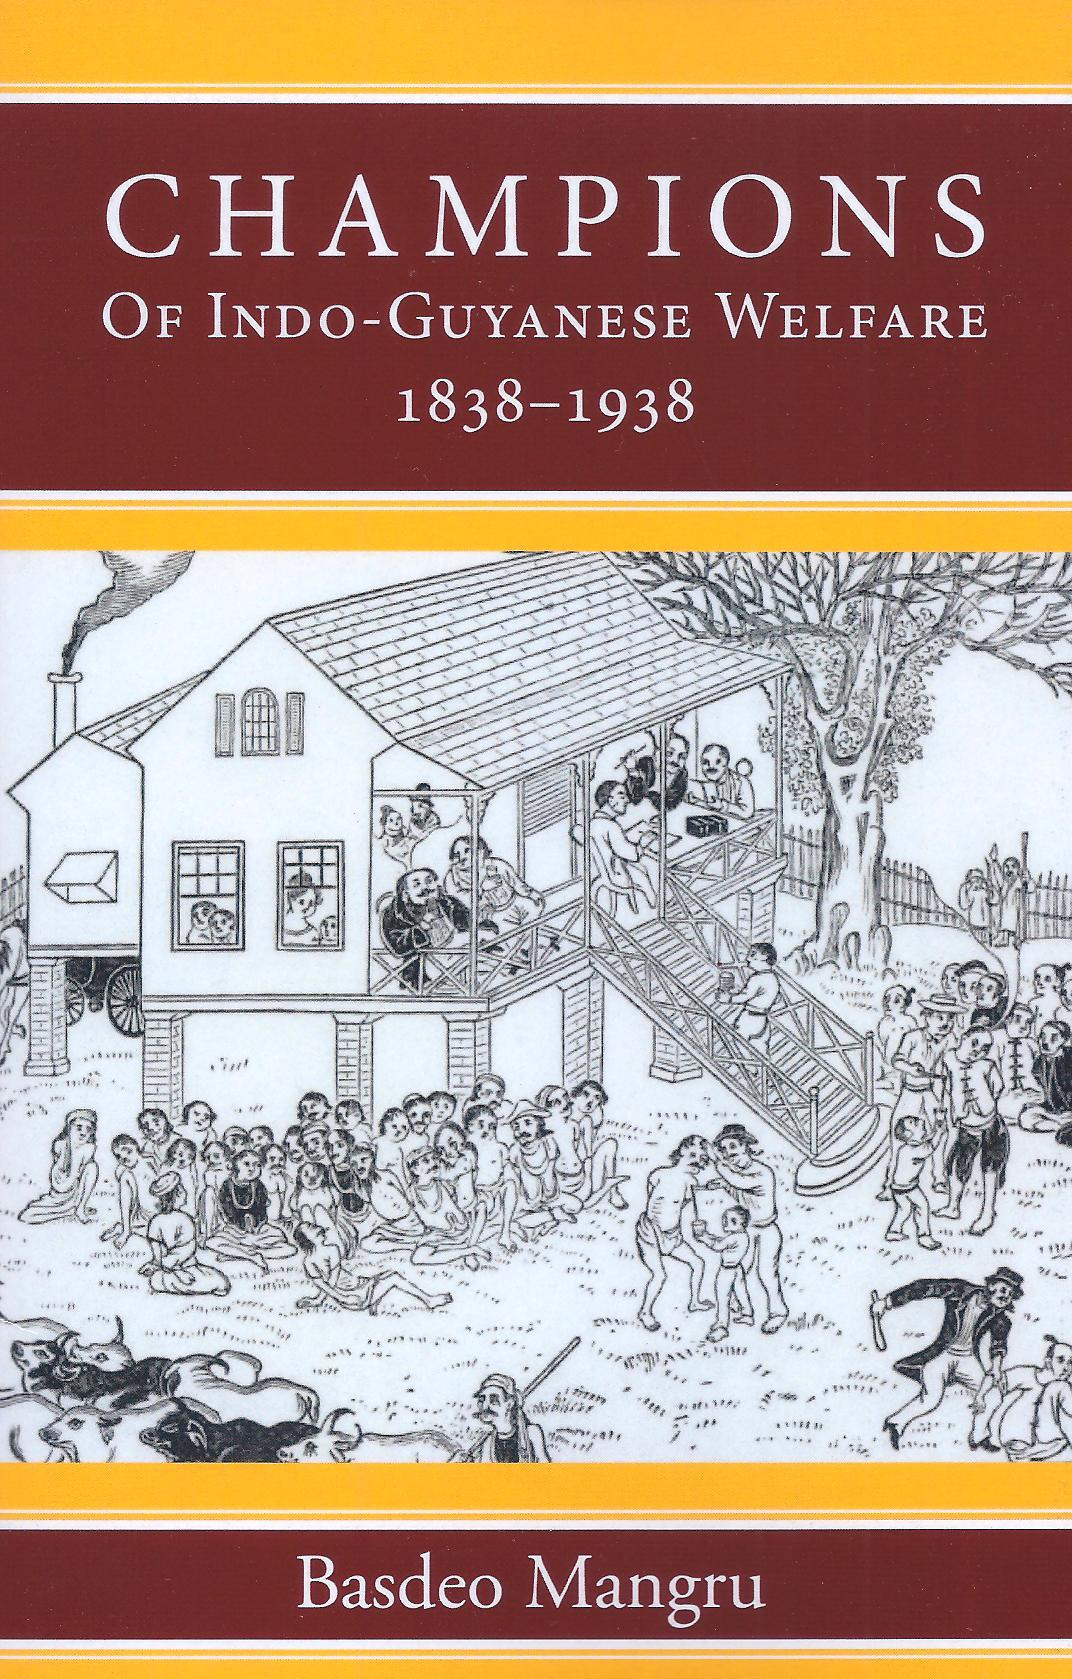 Champions of Indo-Guyanese Welfare 1838-1938 by Prof. Basdeo Mangru